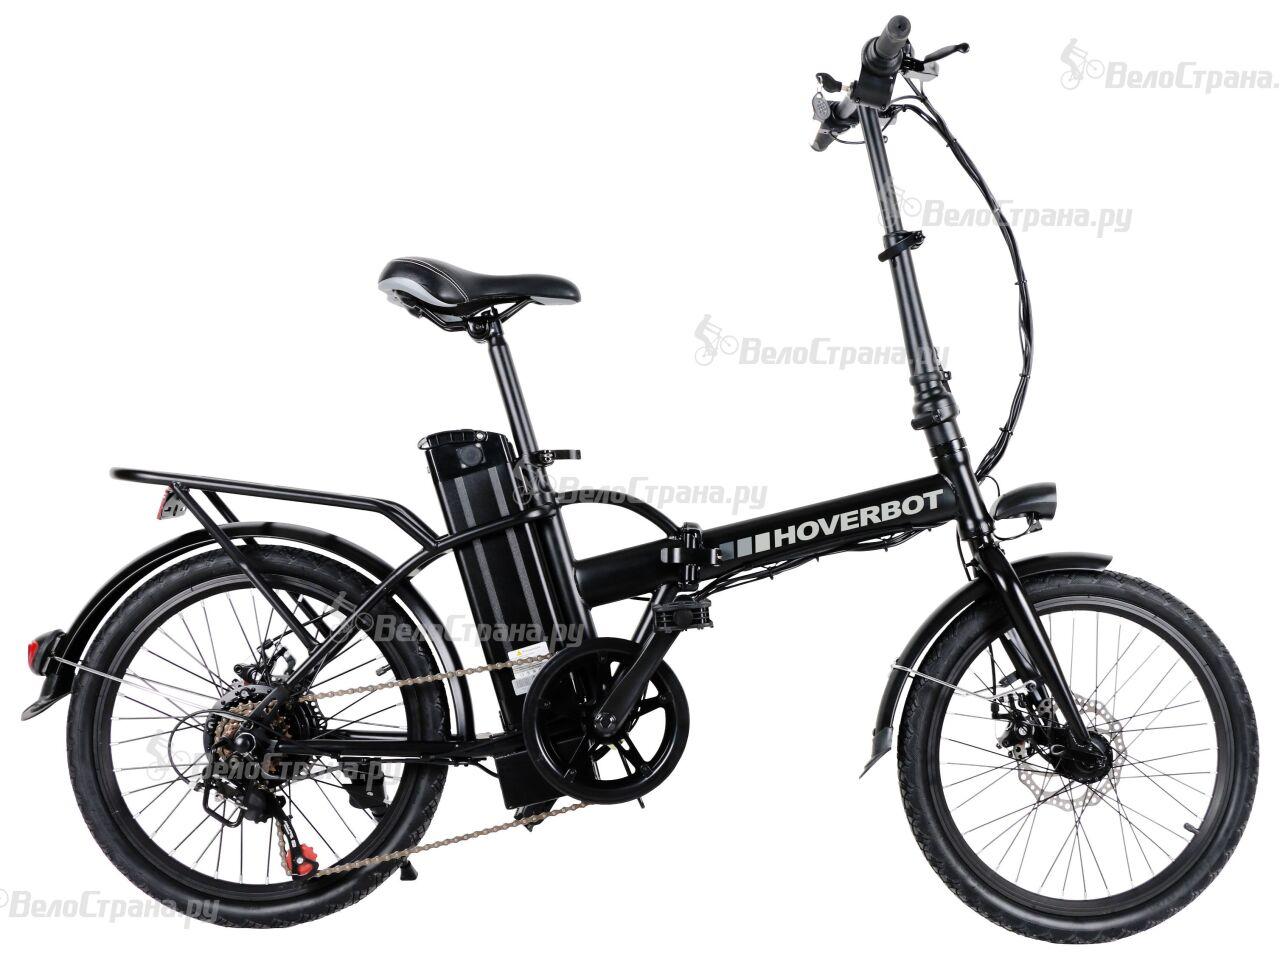 Велосипед Hoverbot CB-7 Optimus (2018) велосипед hoverbot cb 7 optimus 2018